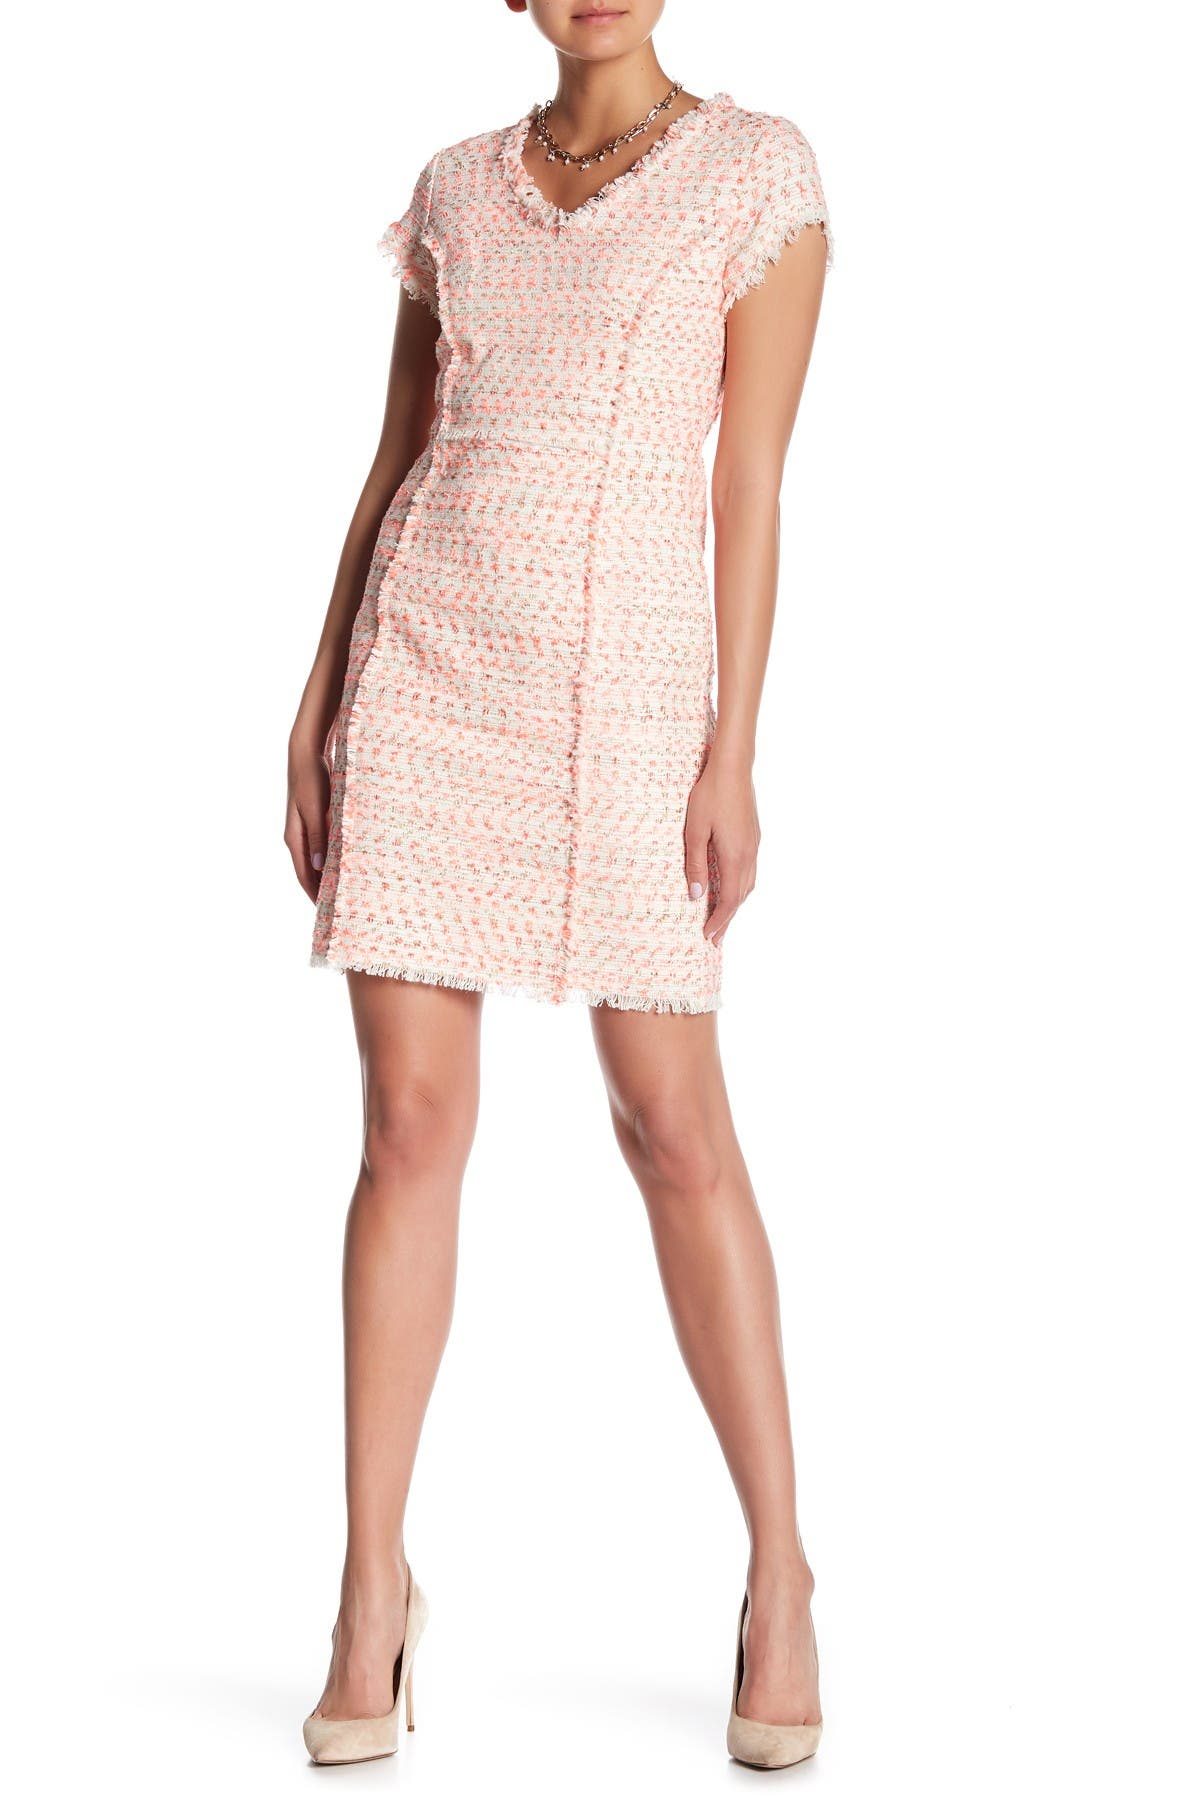 Image of NANETTE nanette lepore Frayed Trim Boucle Dress